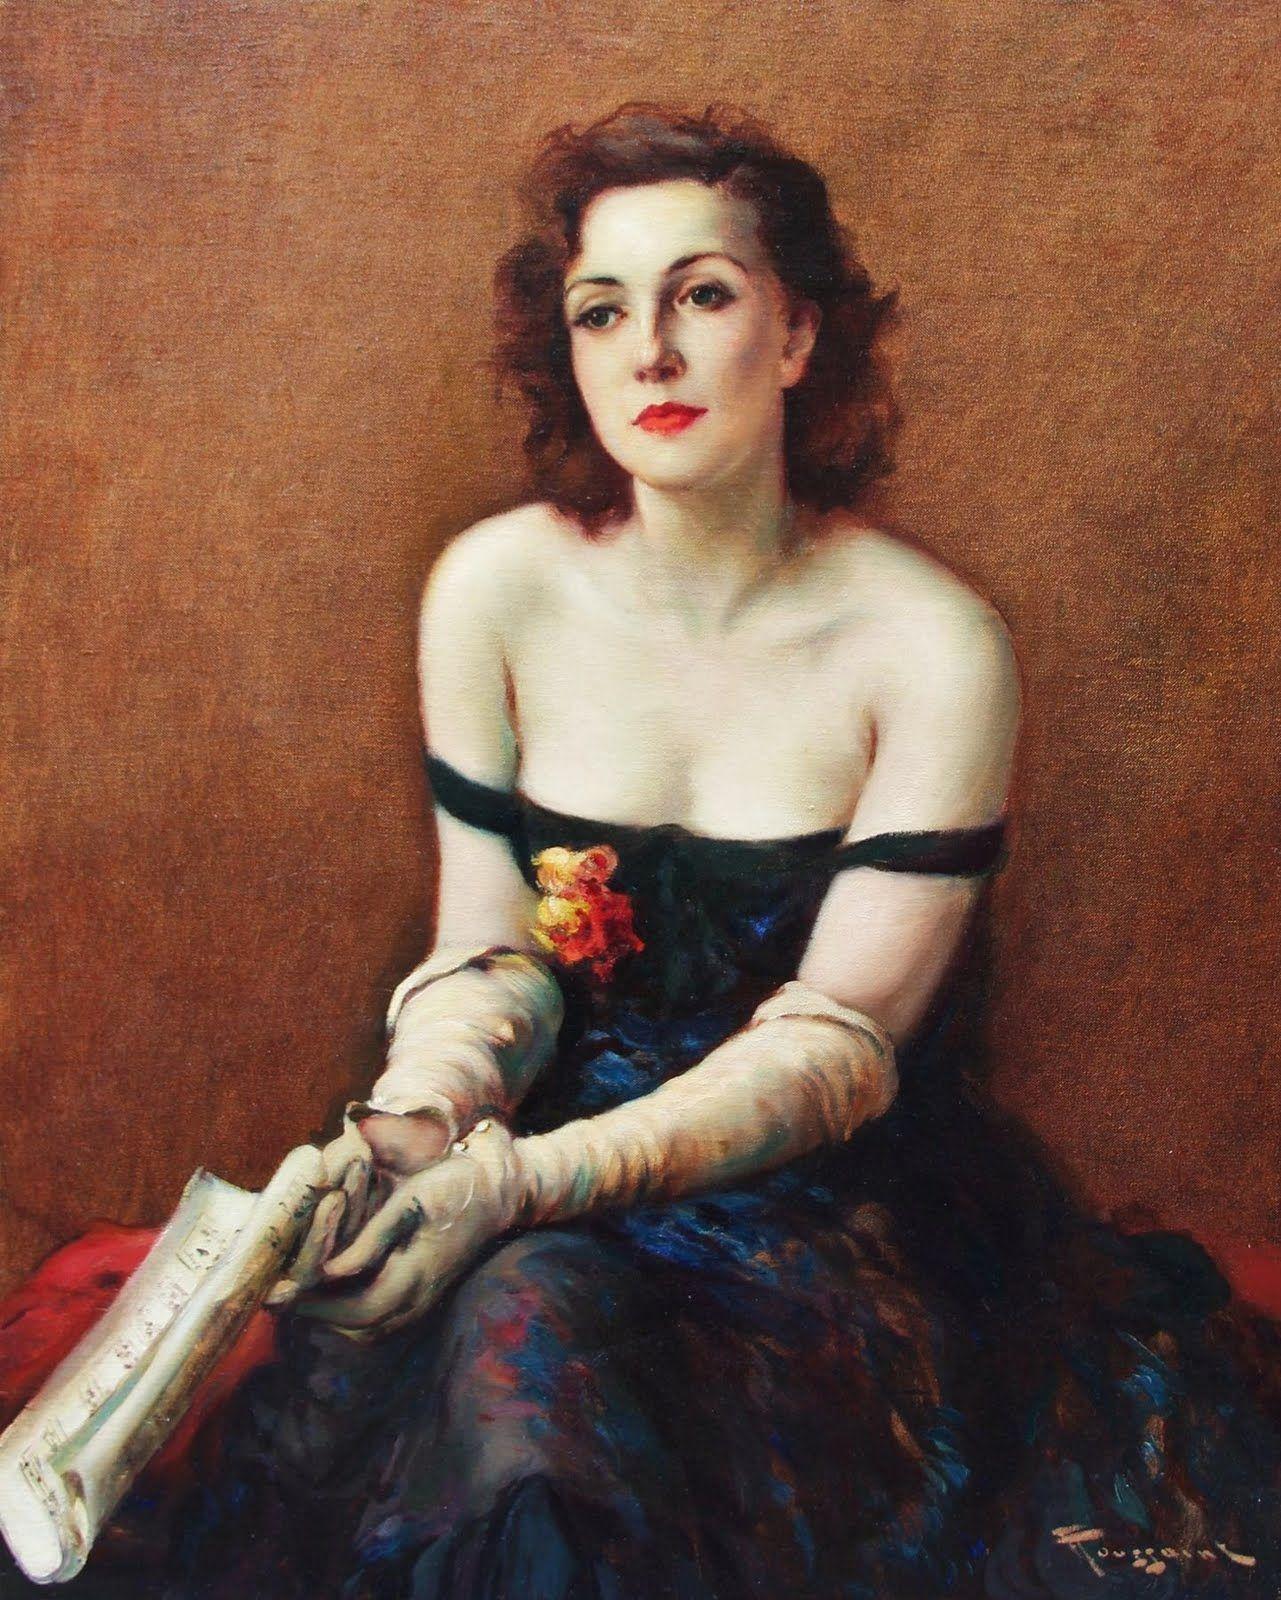 Elegant Lady with Music Score, Fernand Toussaint